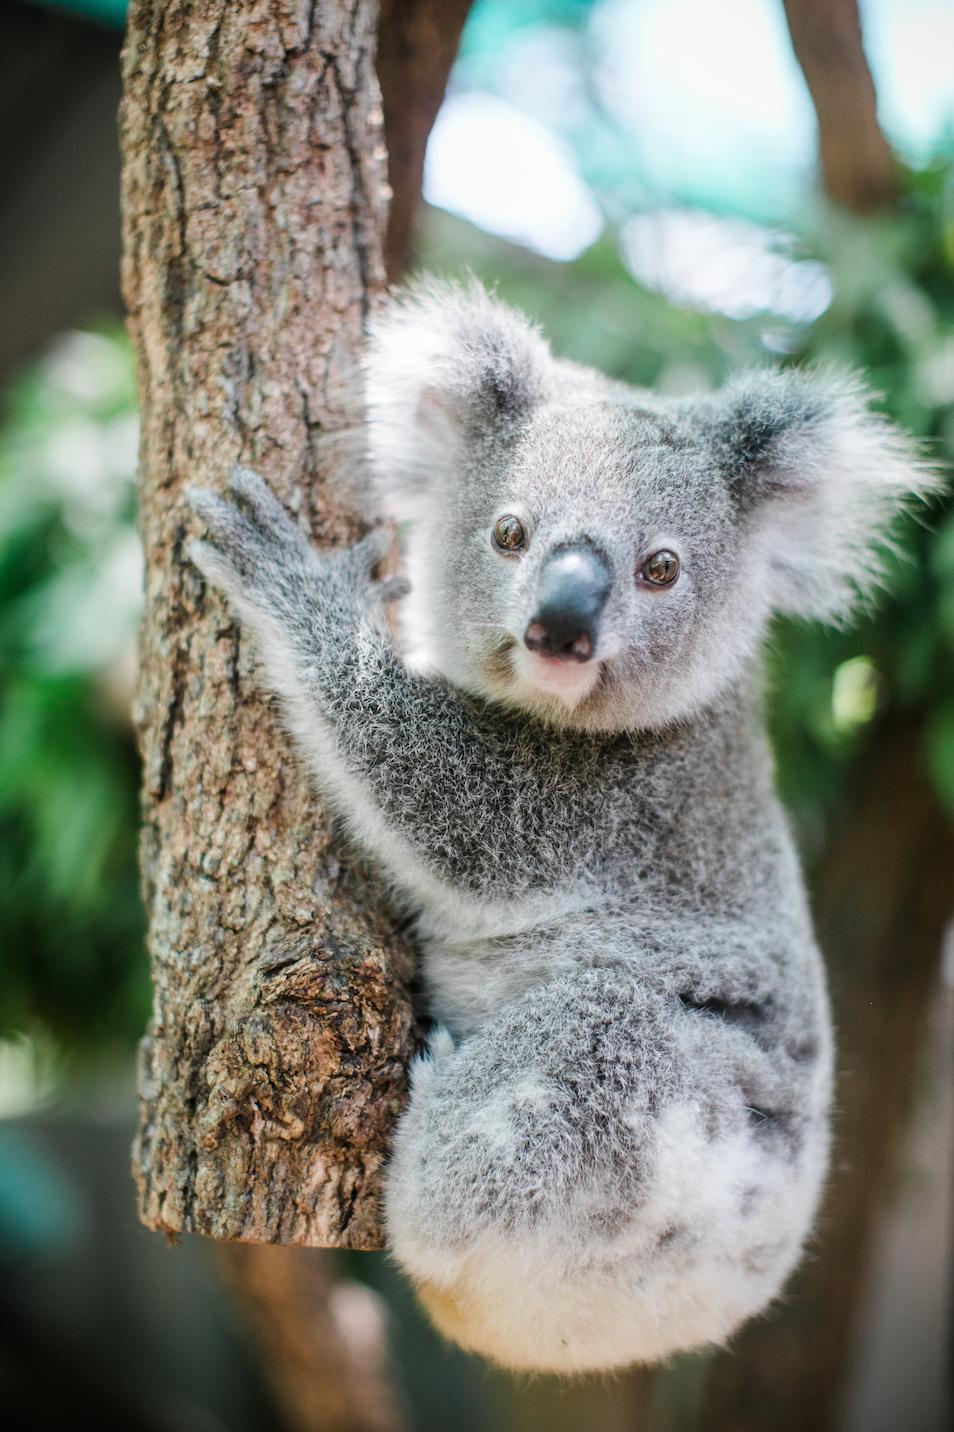 IFAW-Australien-Koalas-Aufforstung-Waldbrände_3.png